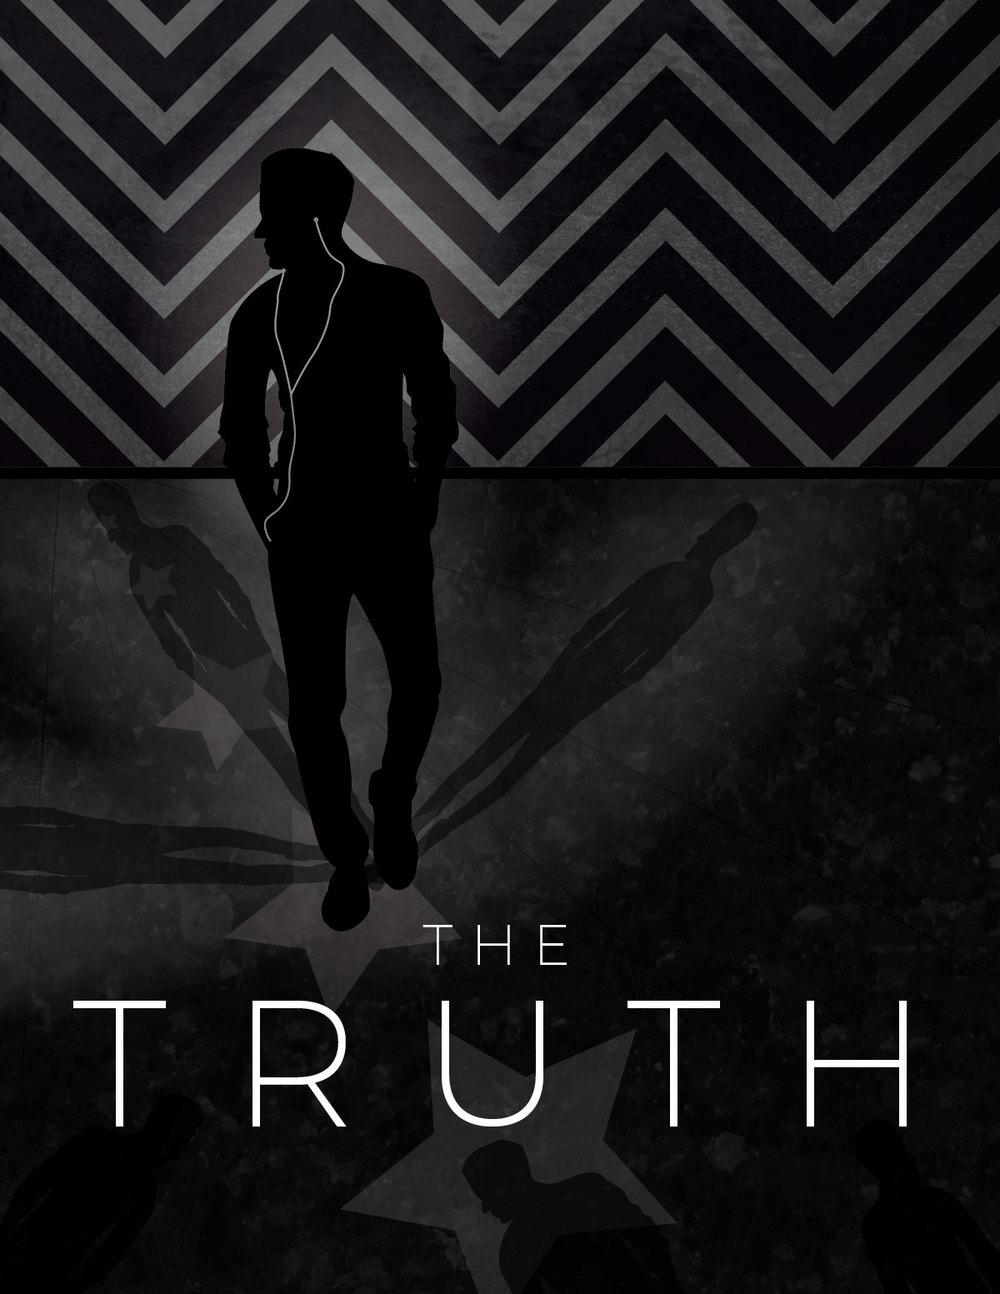 The Truth Postcard/Flyer Design